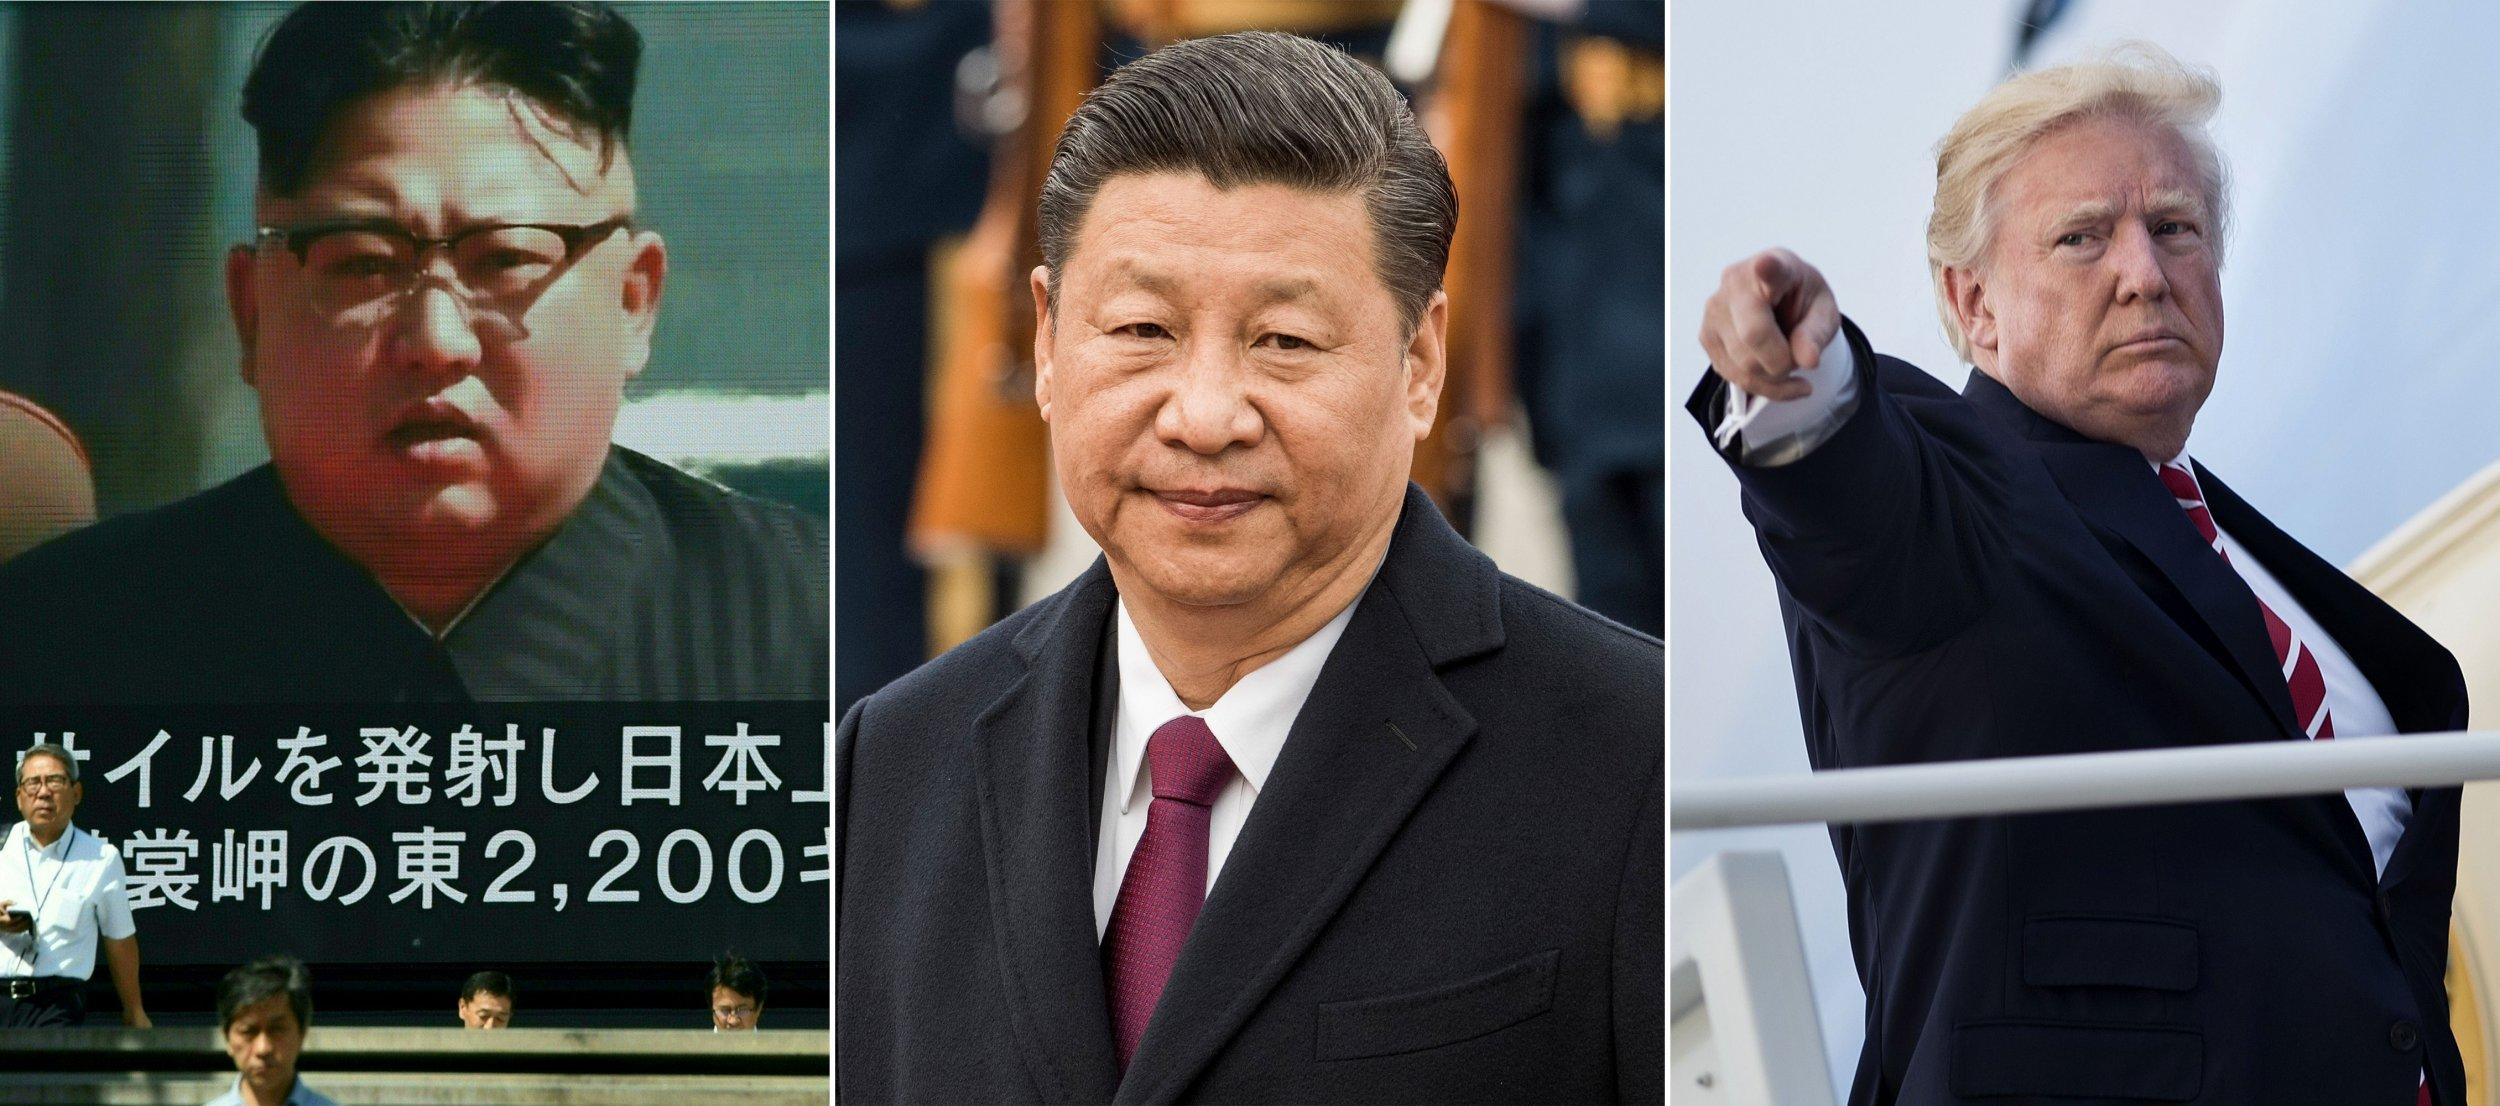 12_28_China_United_States_North_Korea